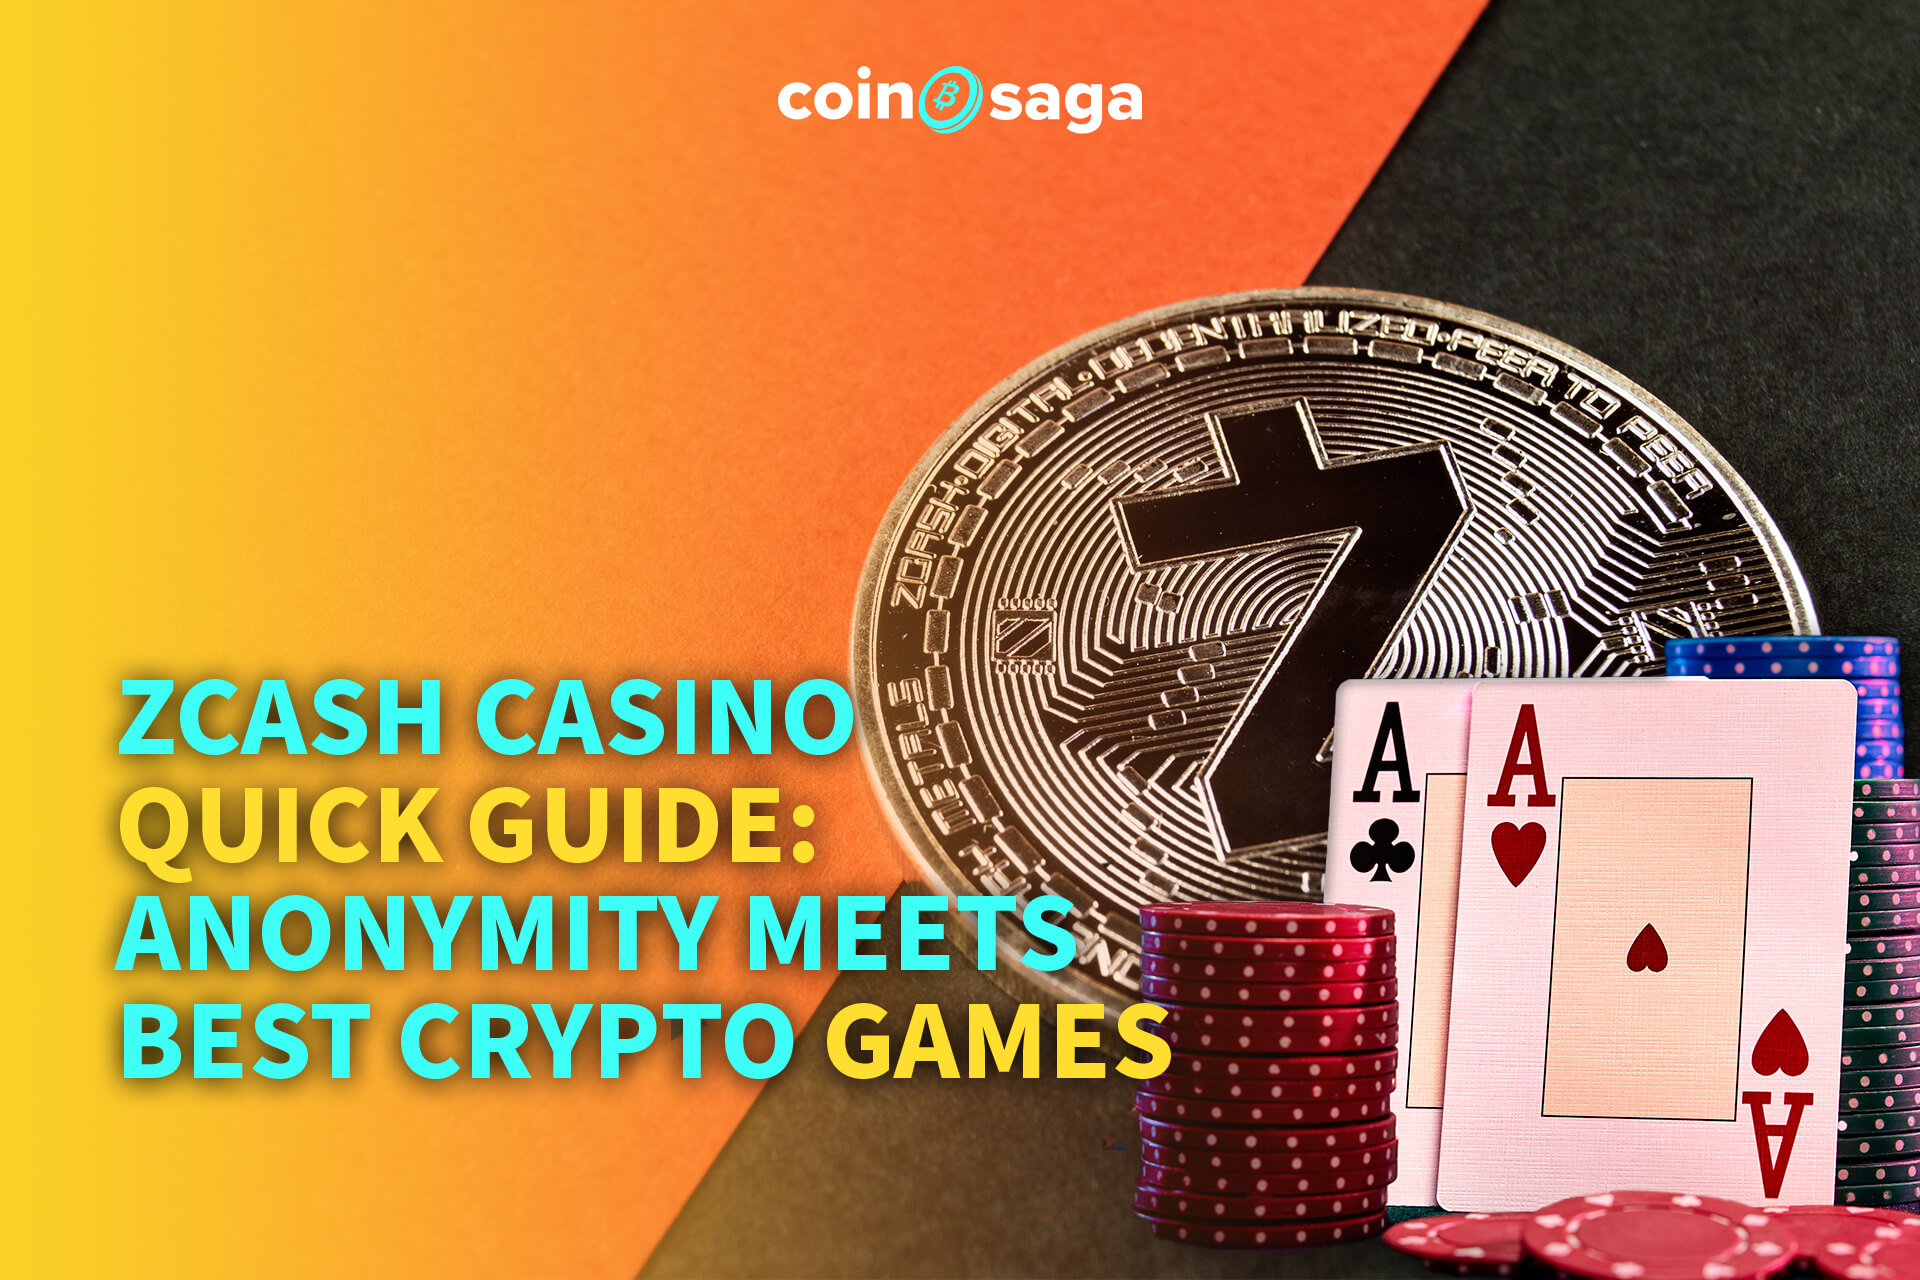 Zcash casino quick guide